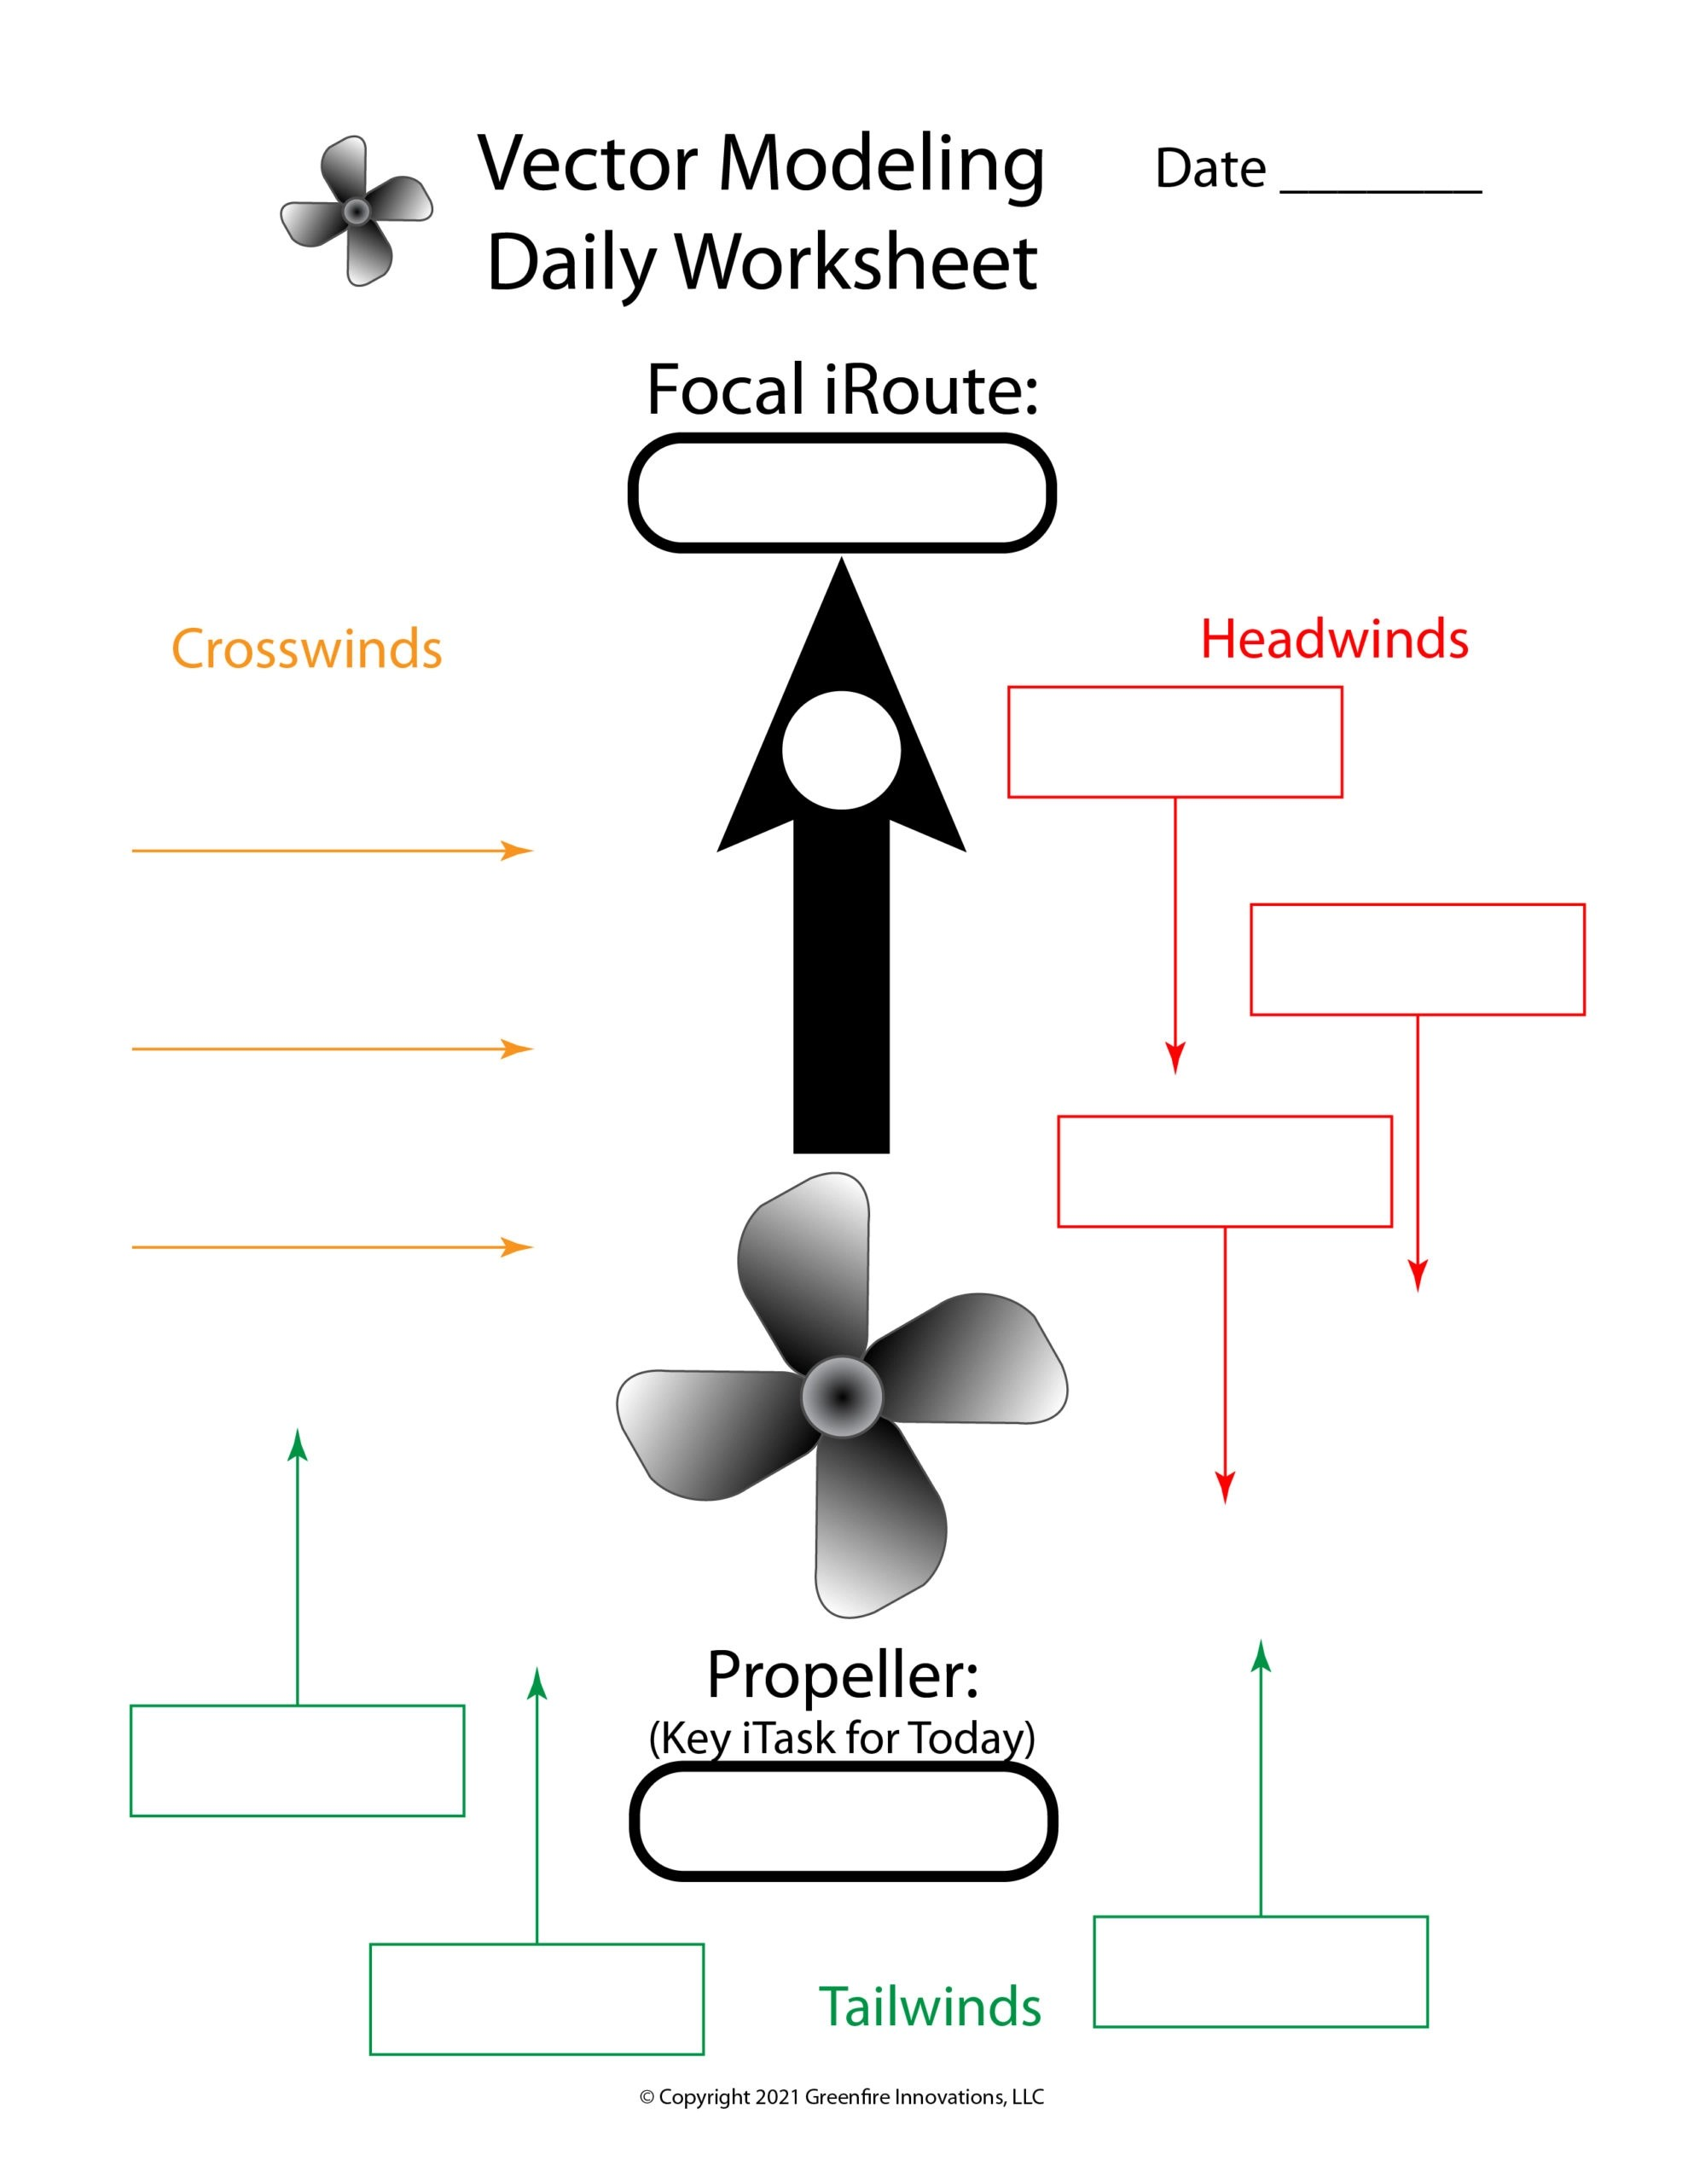 iconVectorModelingDailyWorksheet